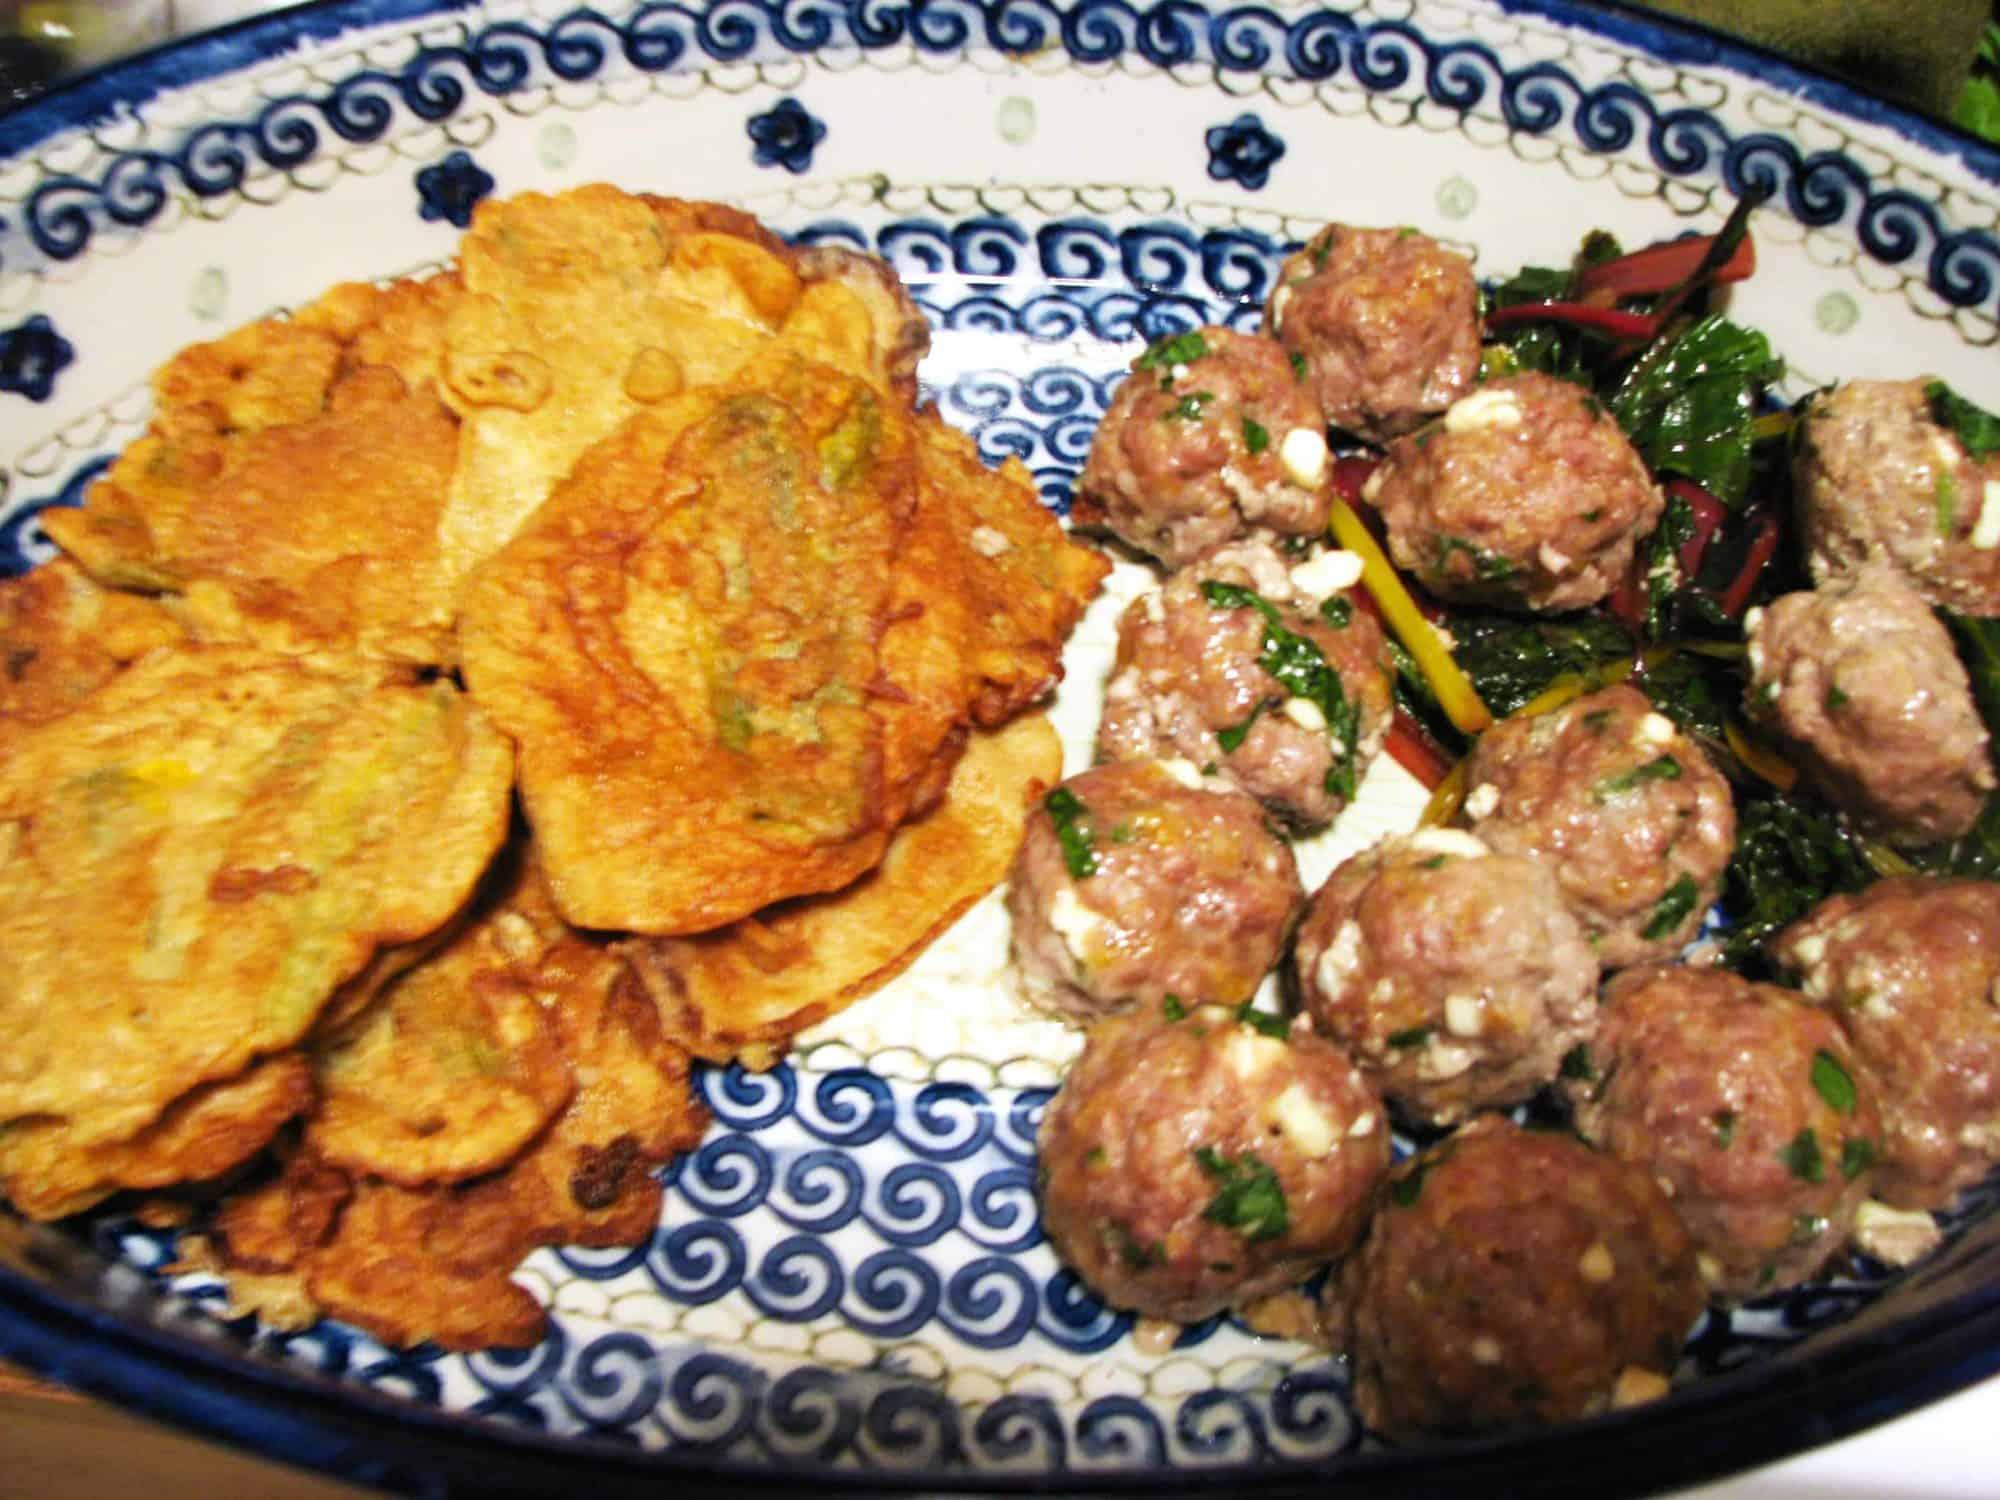 Feta and Parsley Meatballs